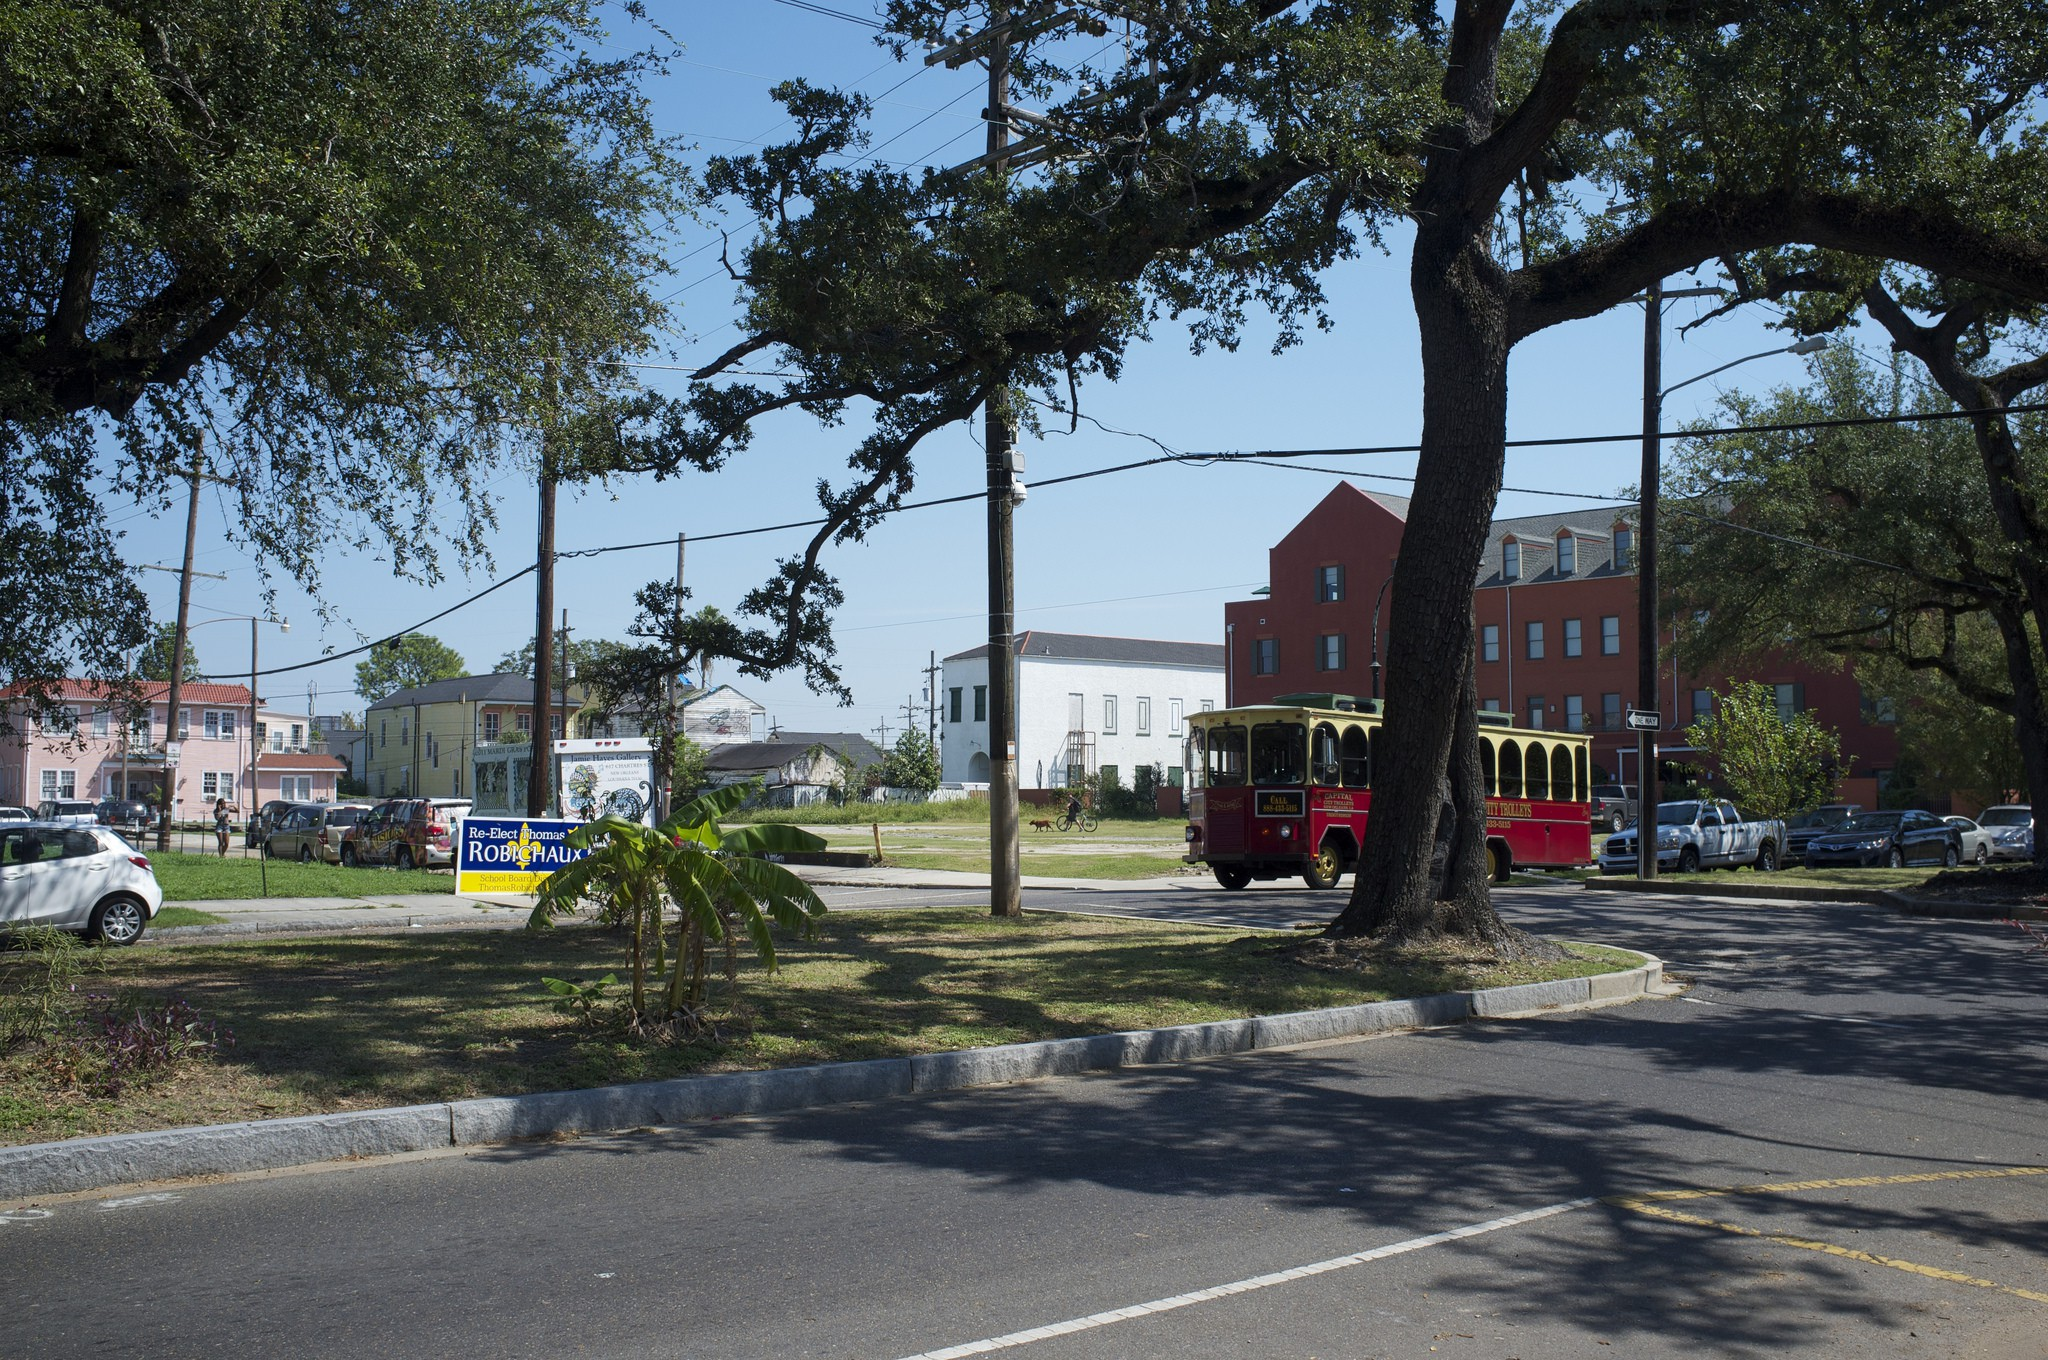 Treme neighborhood, New Orleans, Louisiana | © Aleksandr Zykov/Flickr